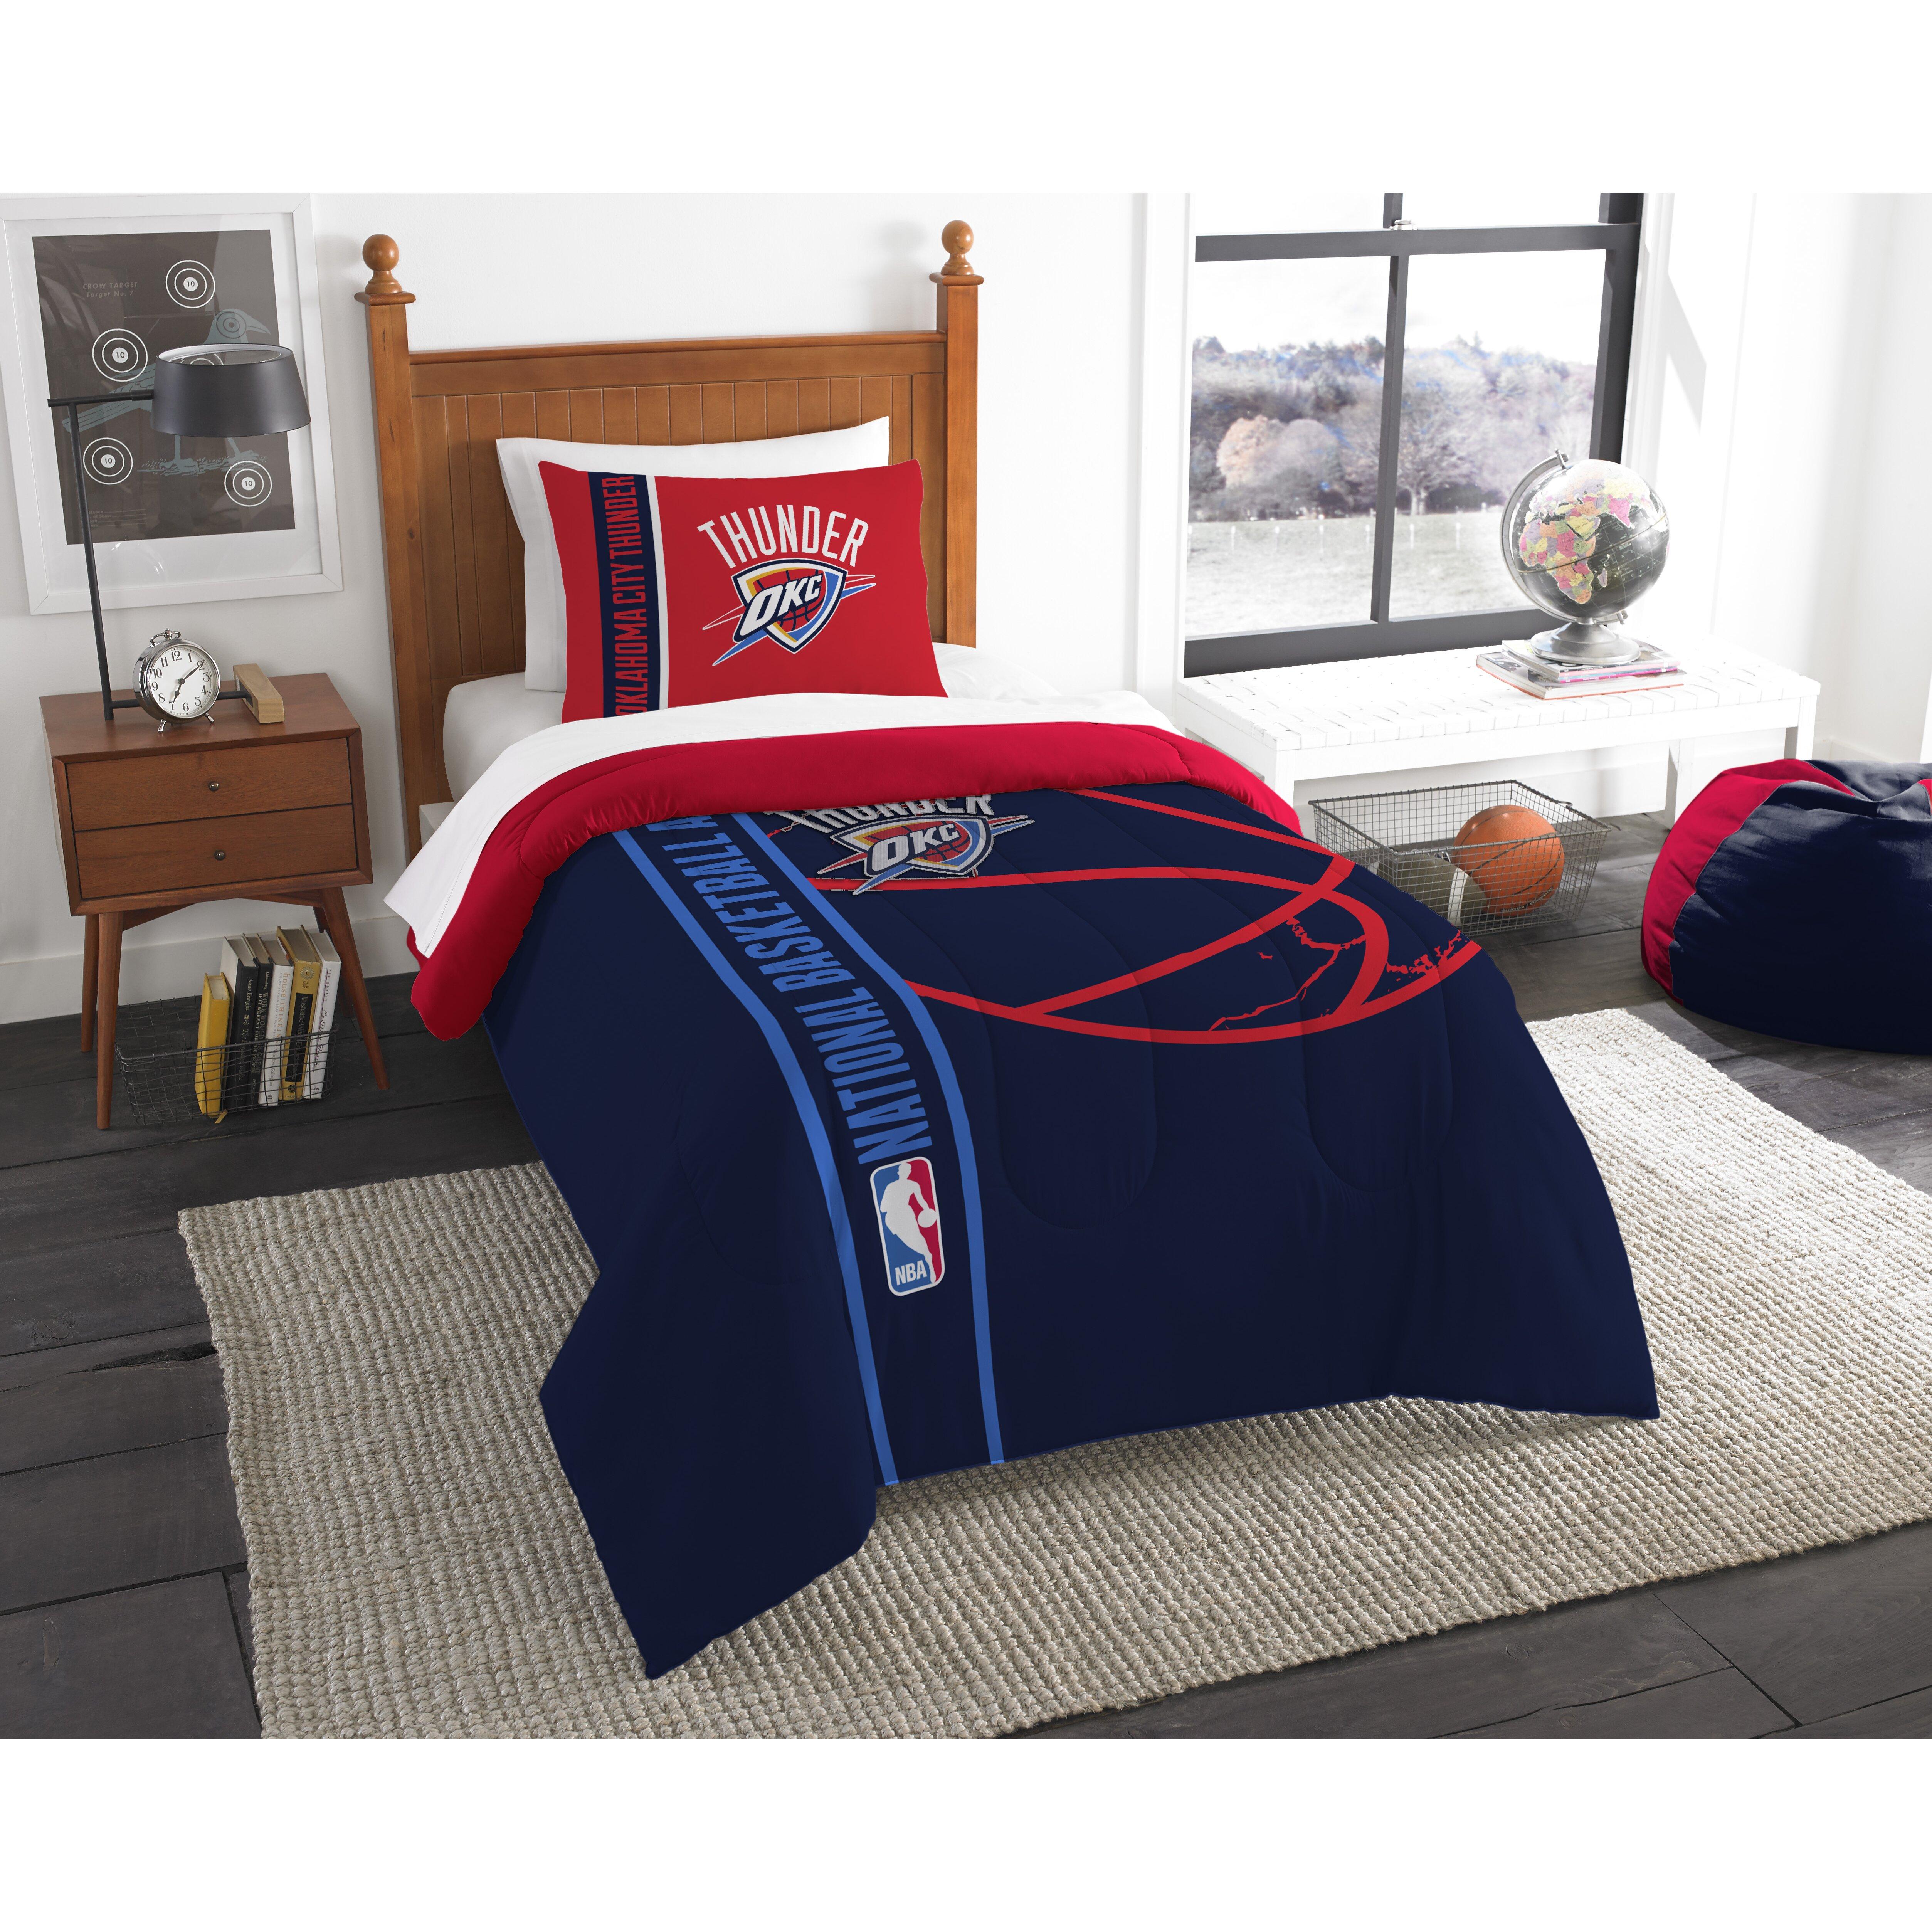 Okc Thunder Bedroom Decor Basketball Comforter Sets